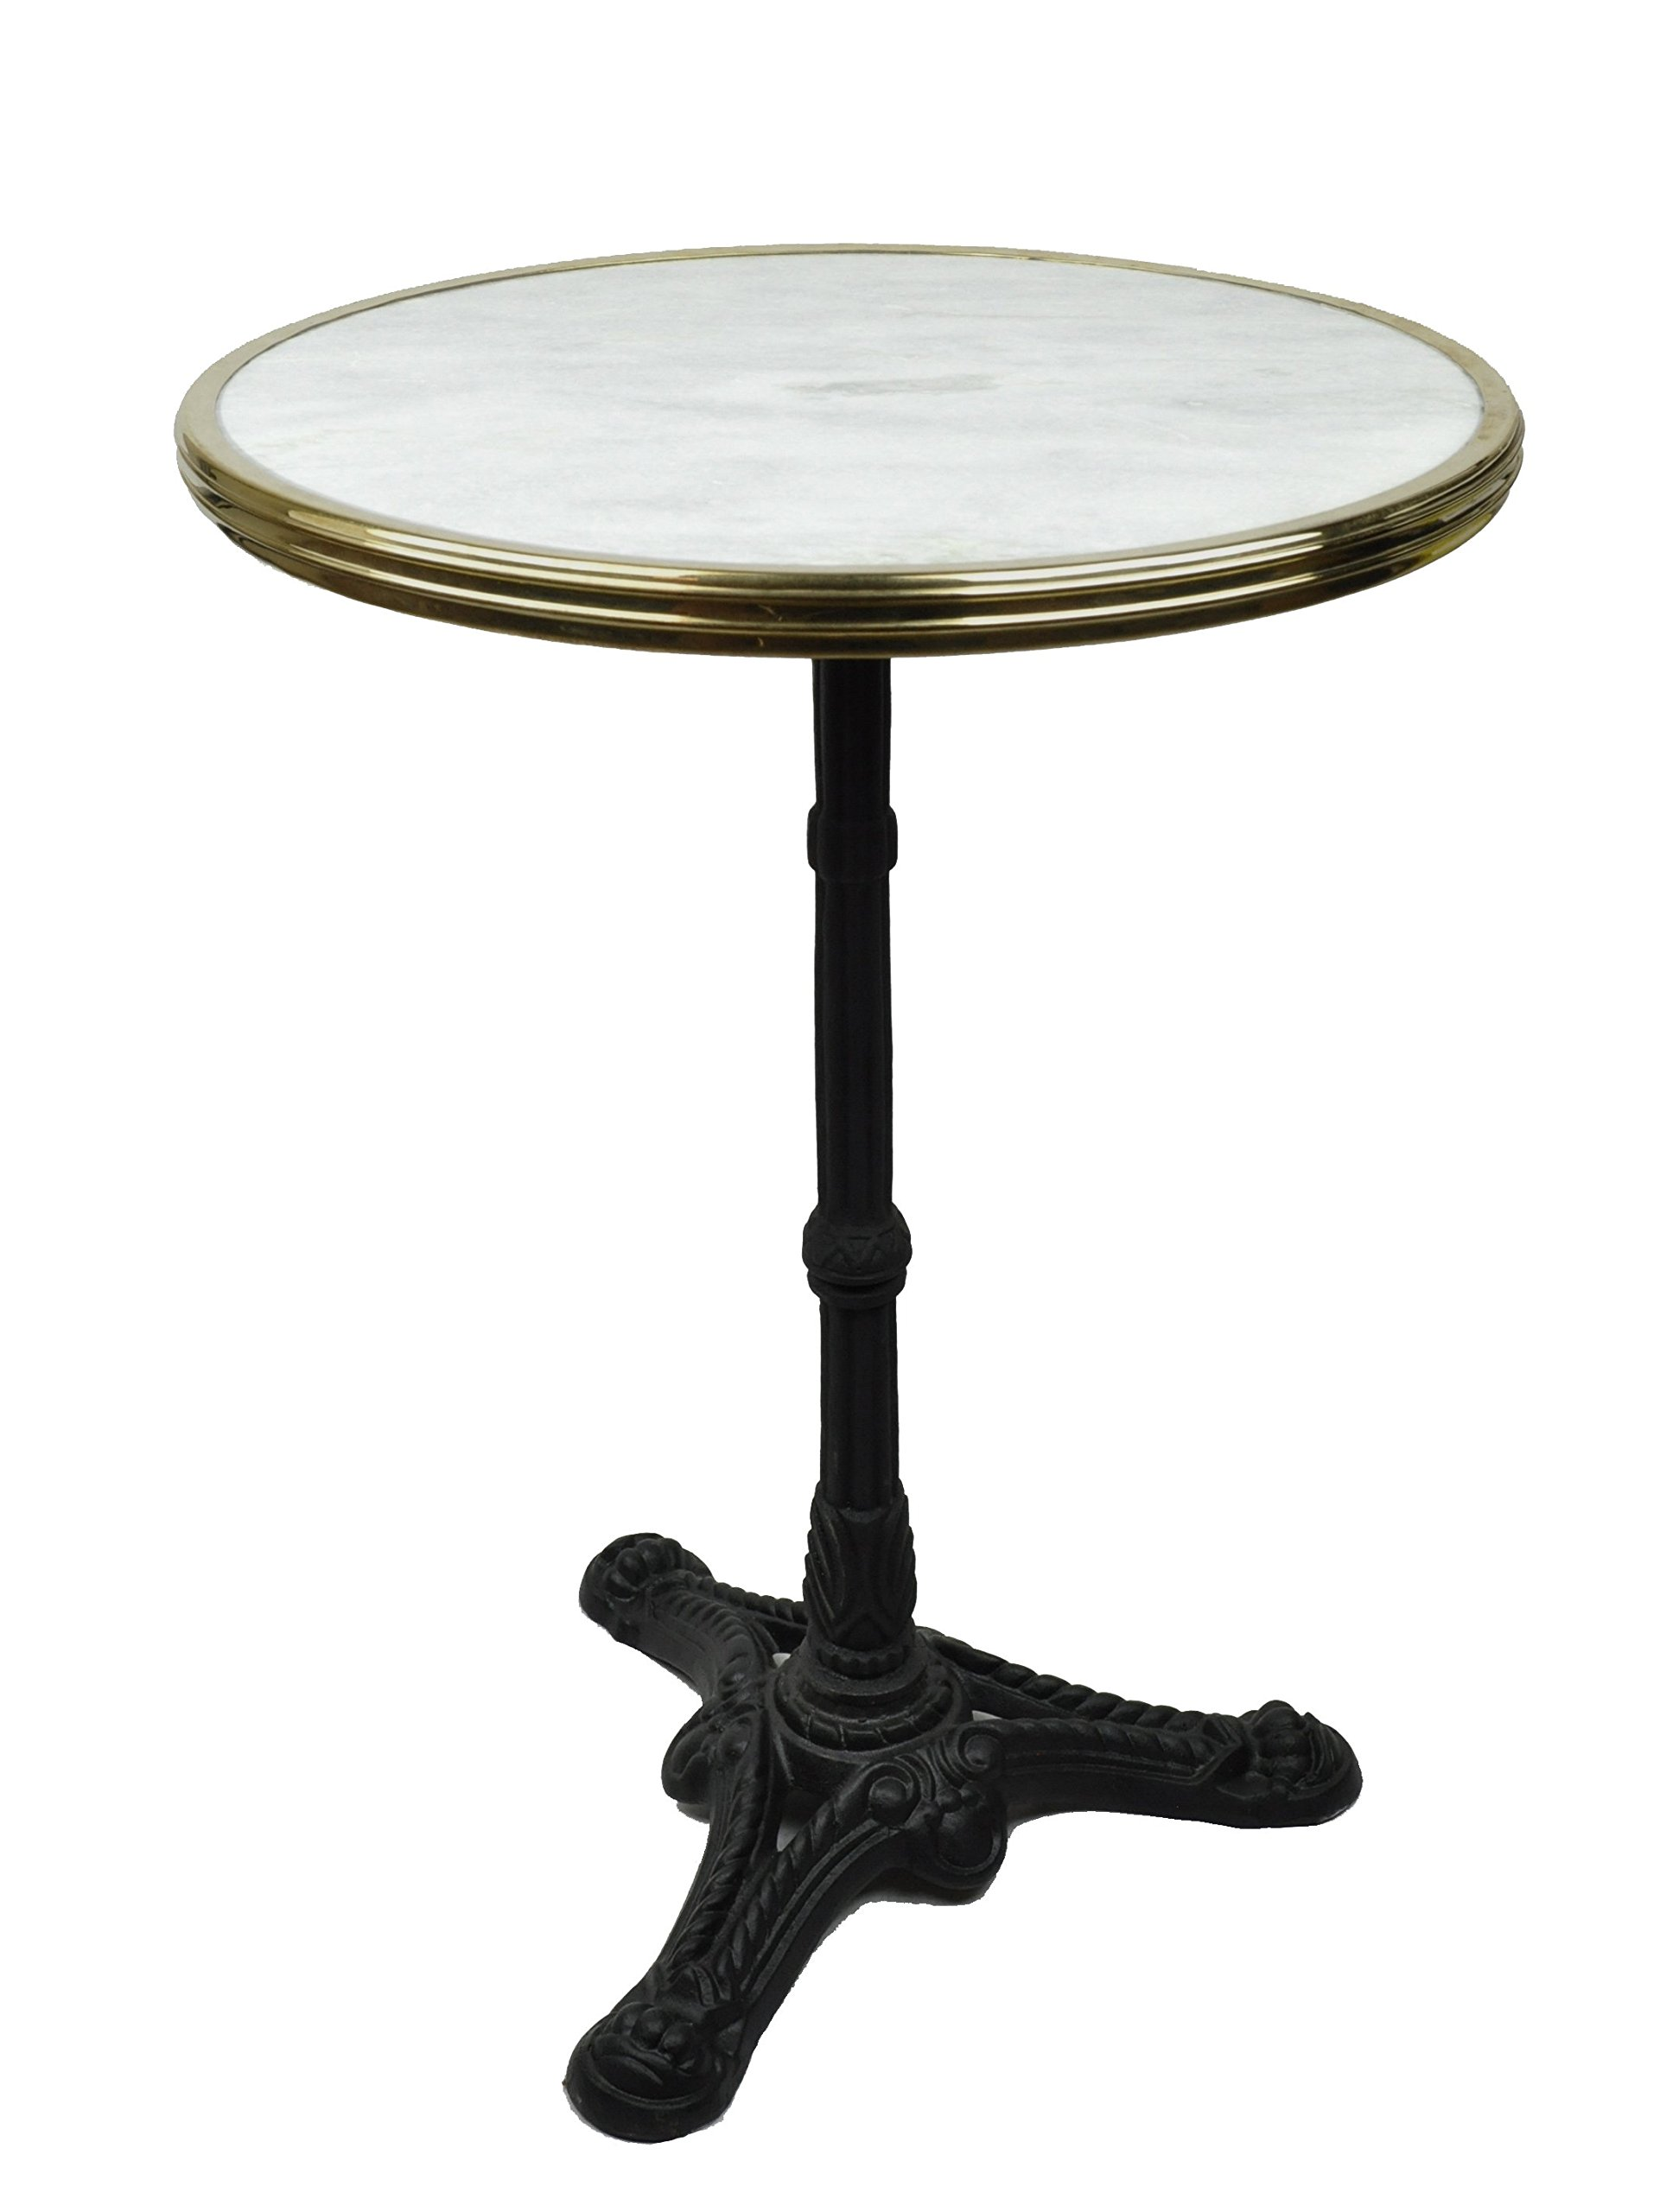 French Bistro Table, White Marble & Iron Base